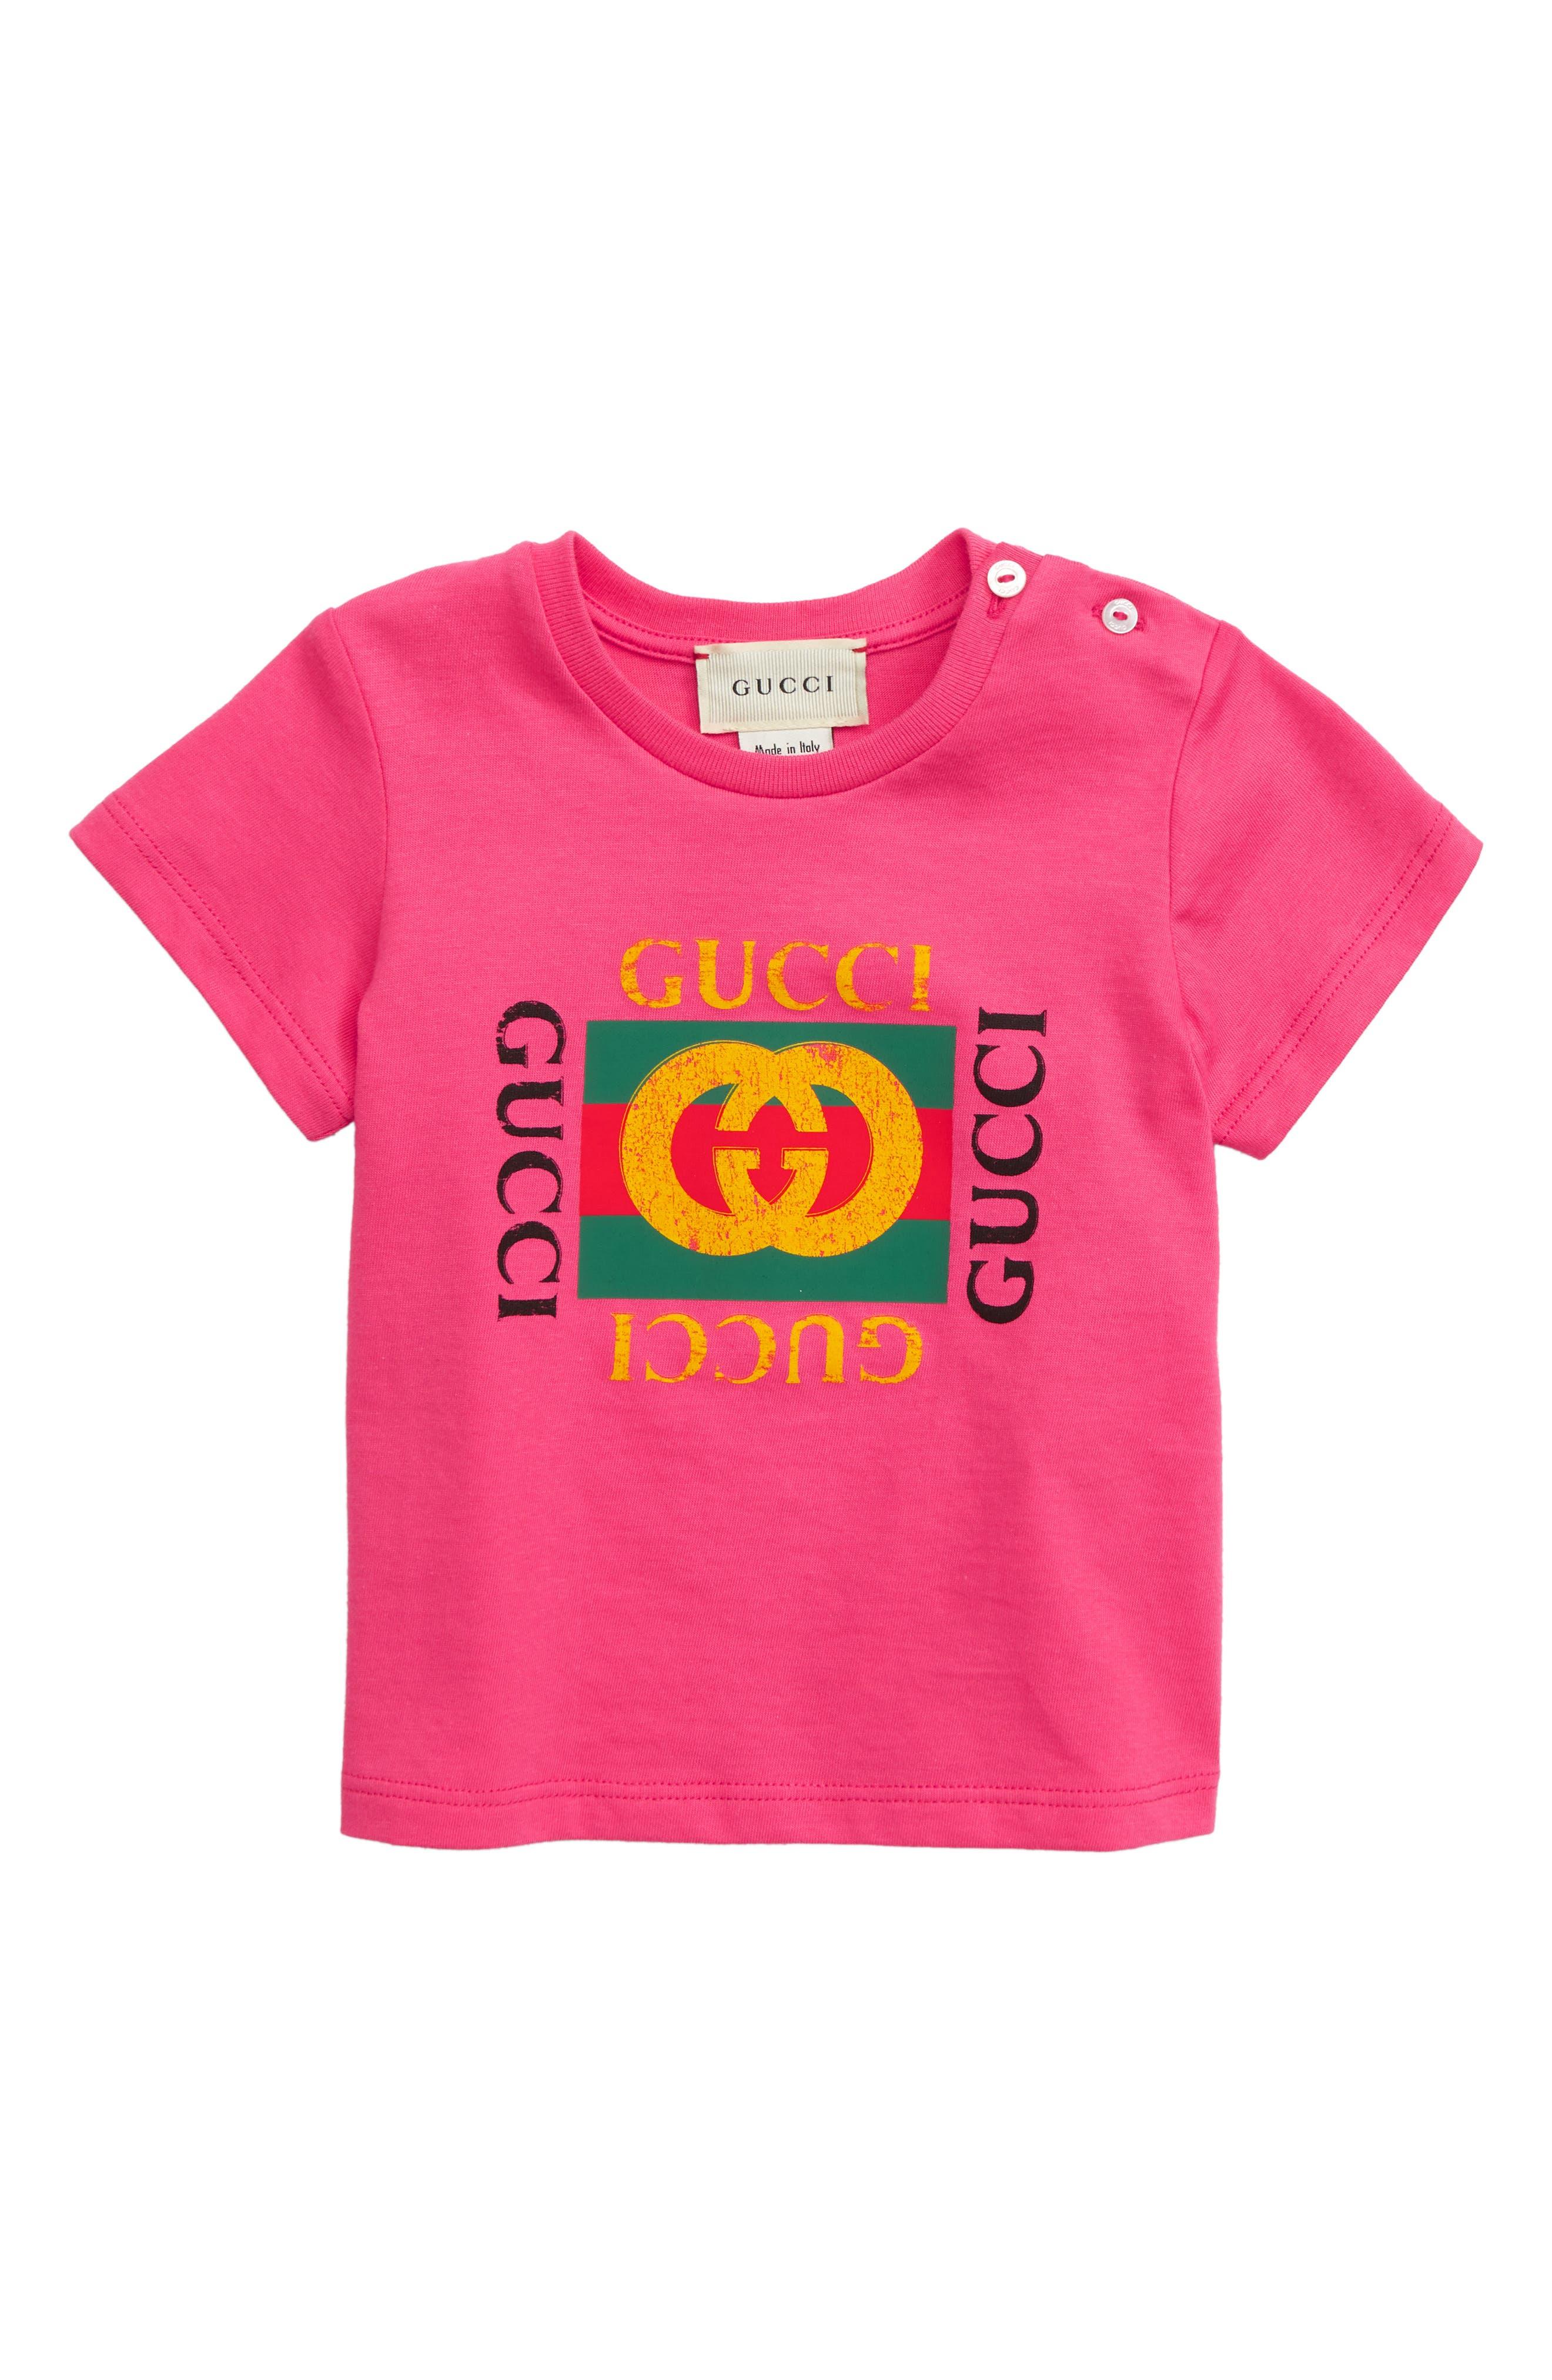 3ea2c3cc9fa Gucci Baby Clothing